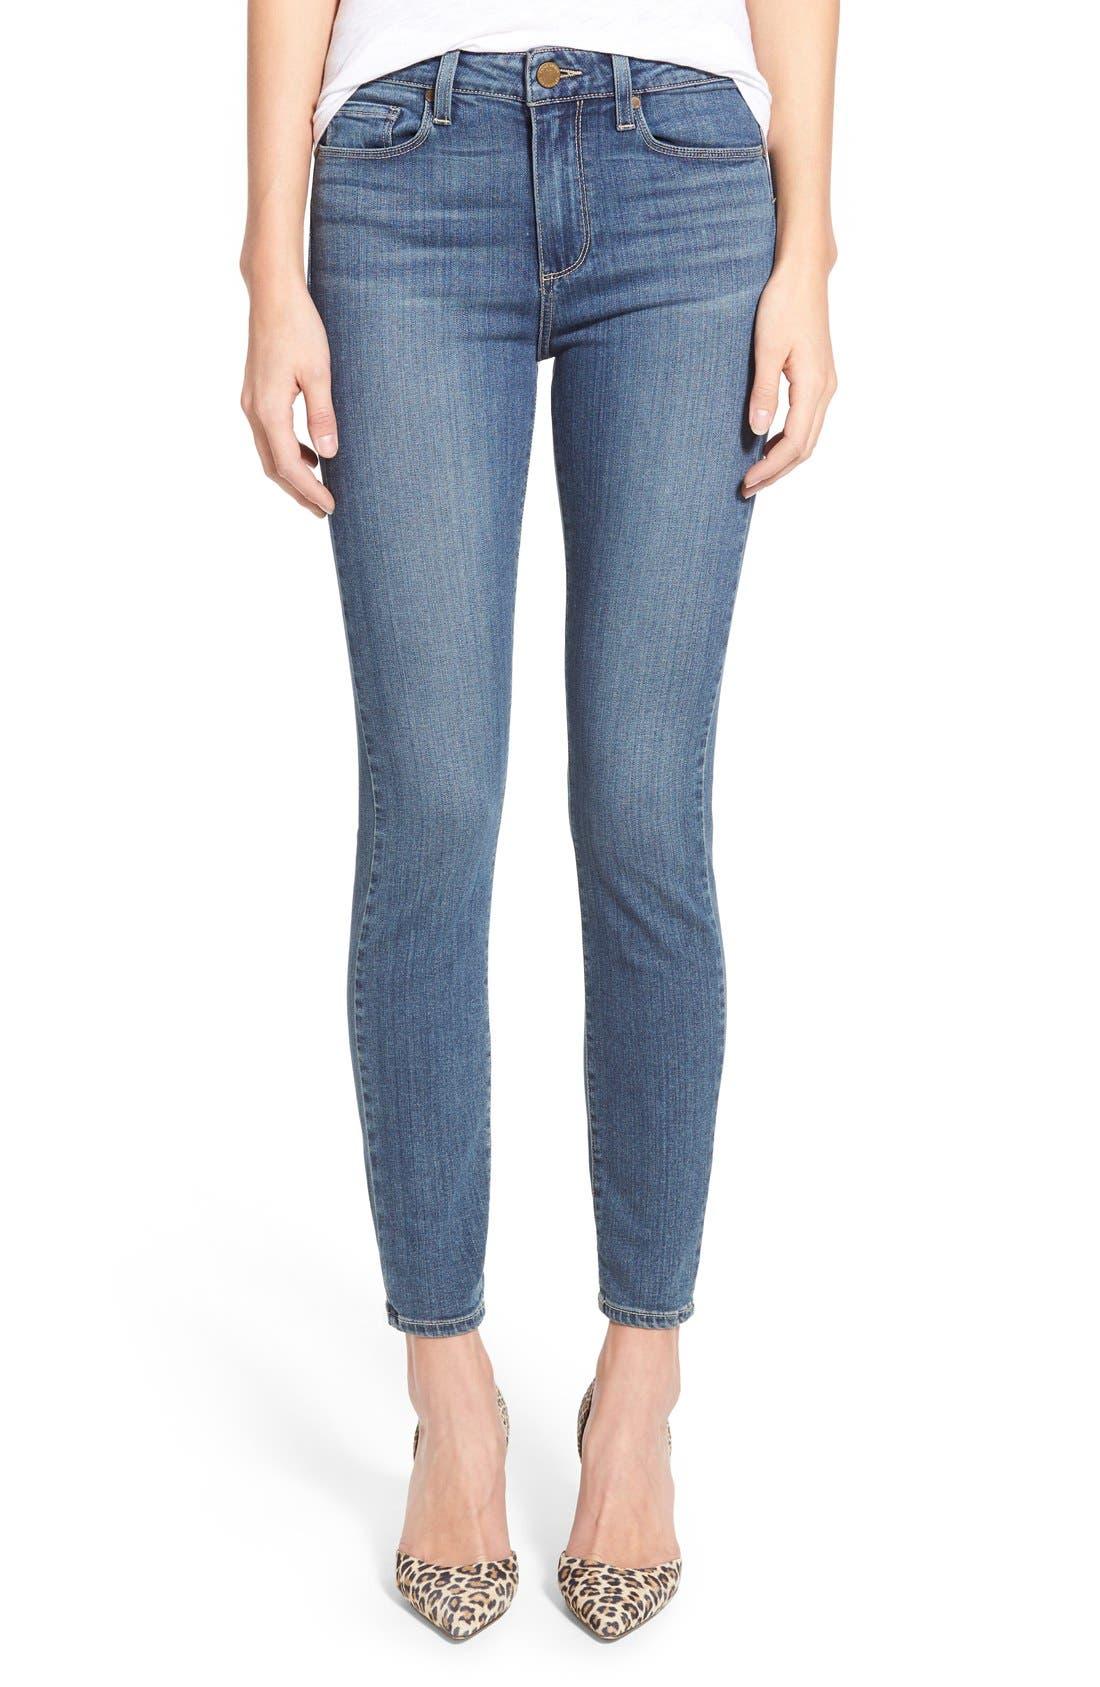 Alternate Image 1 Selected - Paige Denim 'Transcend - Hoxton' High Rise Ankle Ultra Skinny Jeans (Linden)